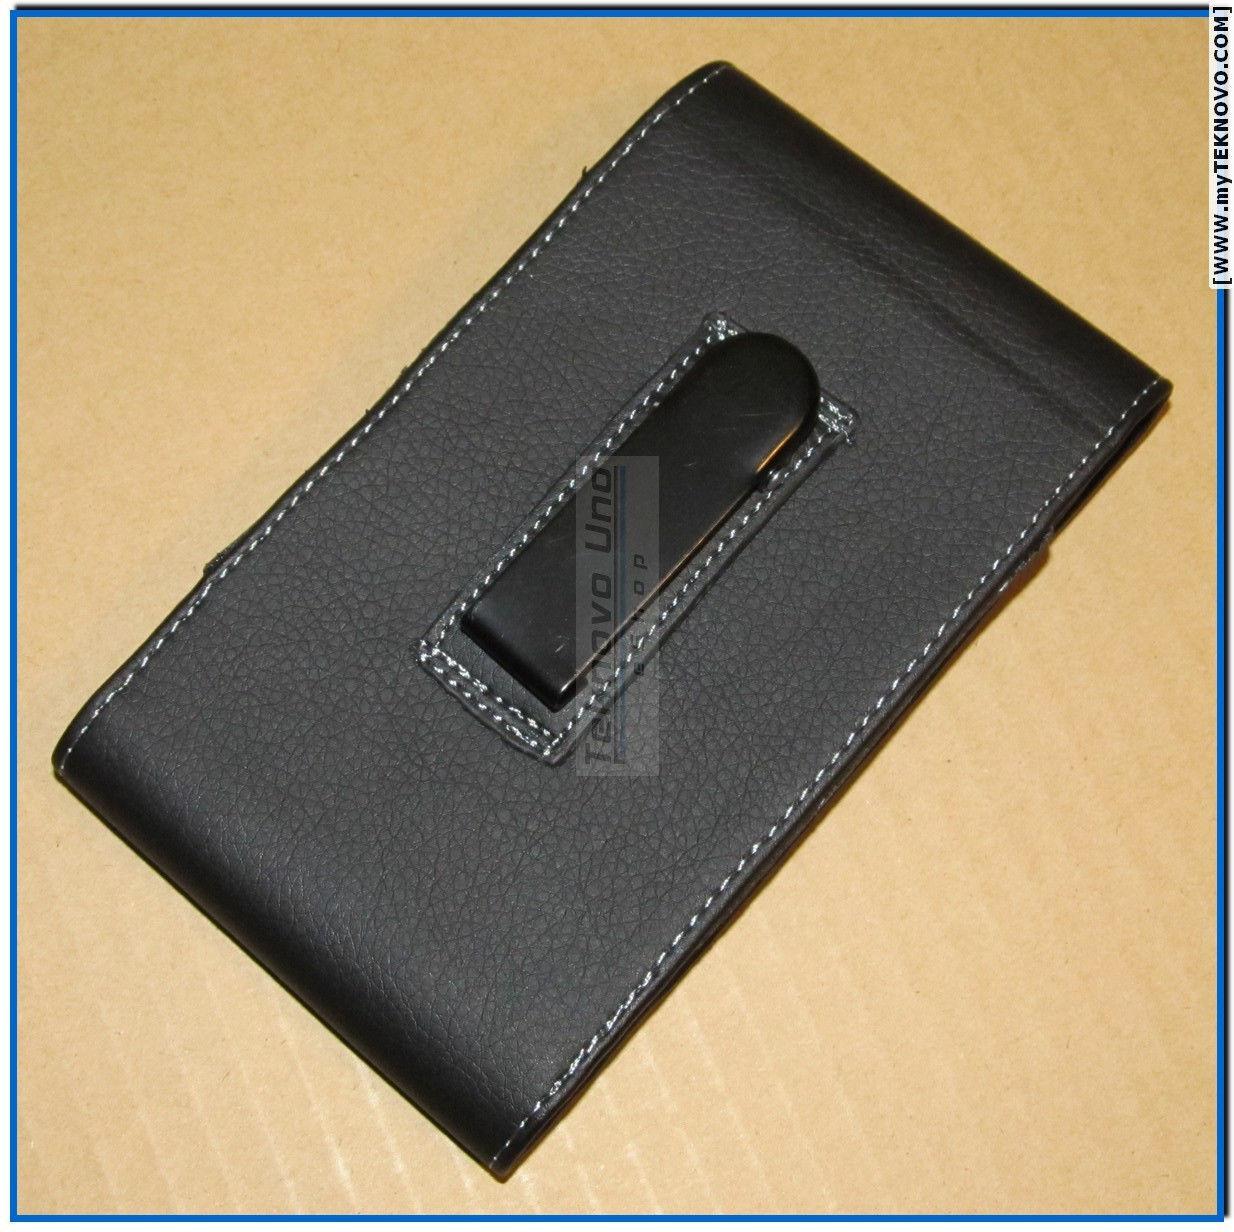 Belt Clip CASE Pouch for  HP 10c 11c 12c 12CP HP 15c 16c 17BII+ 10BII+ NEW USA